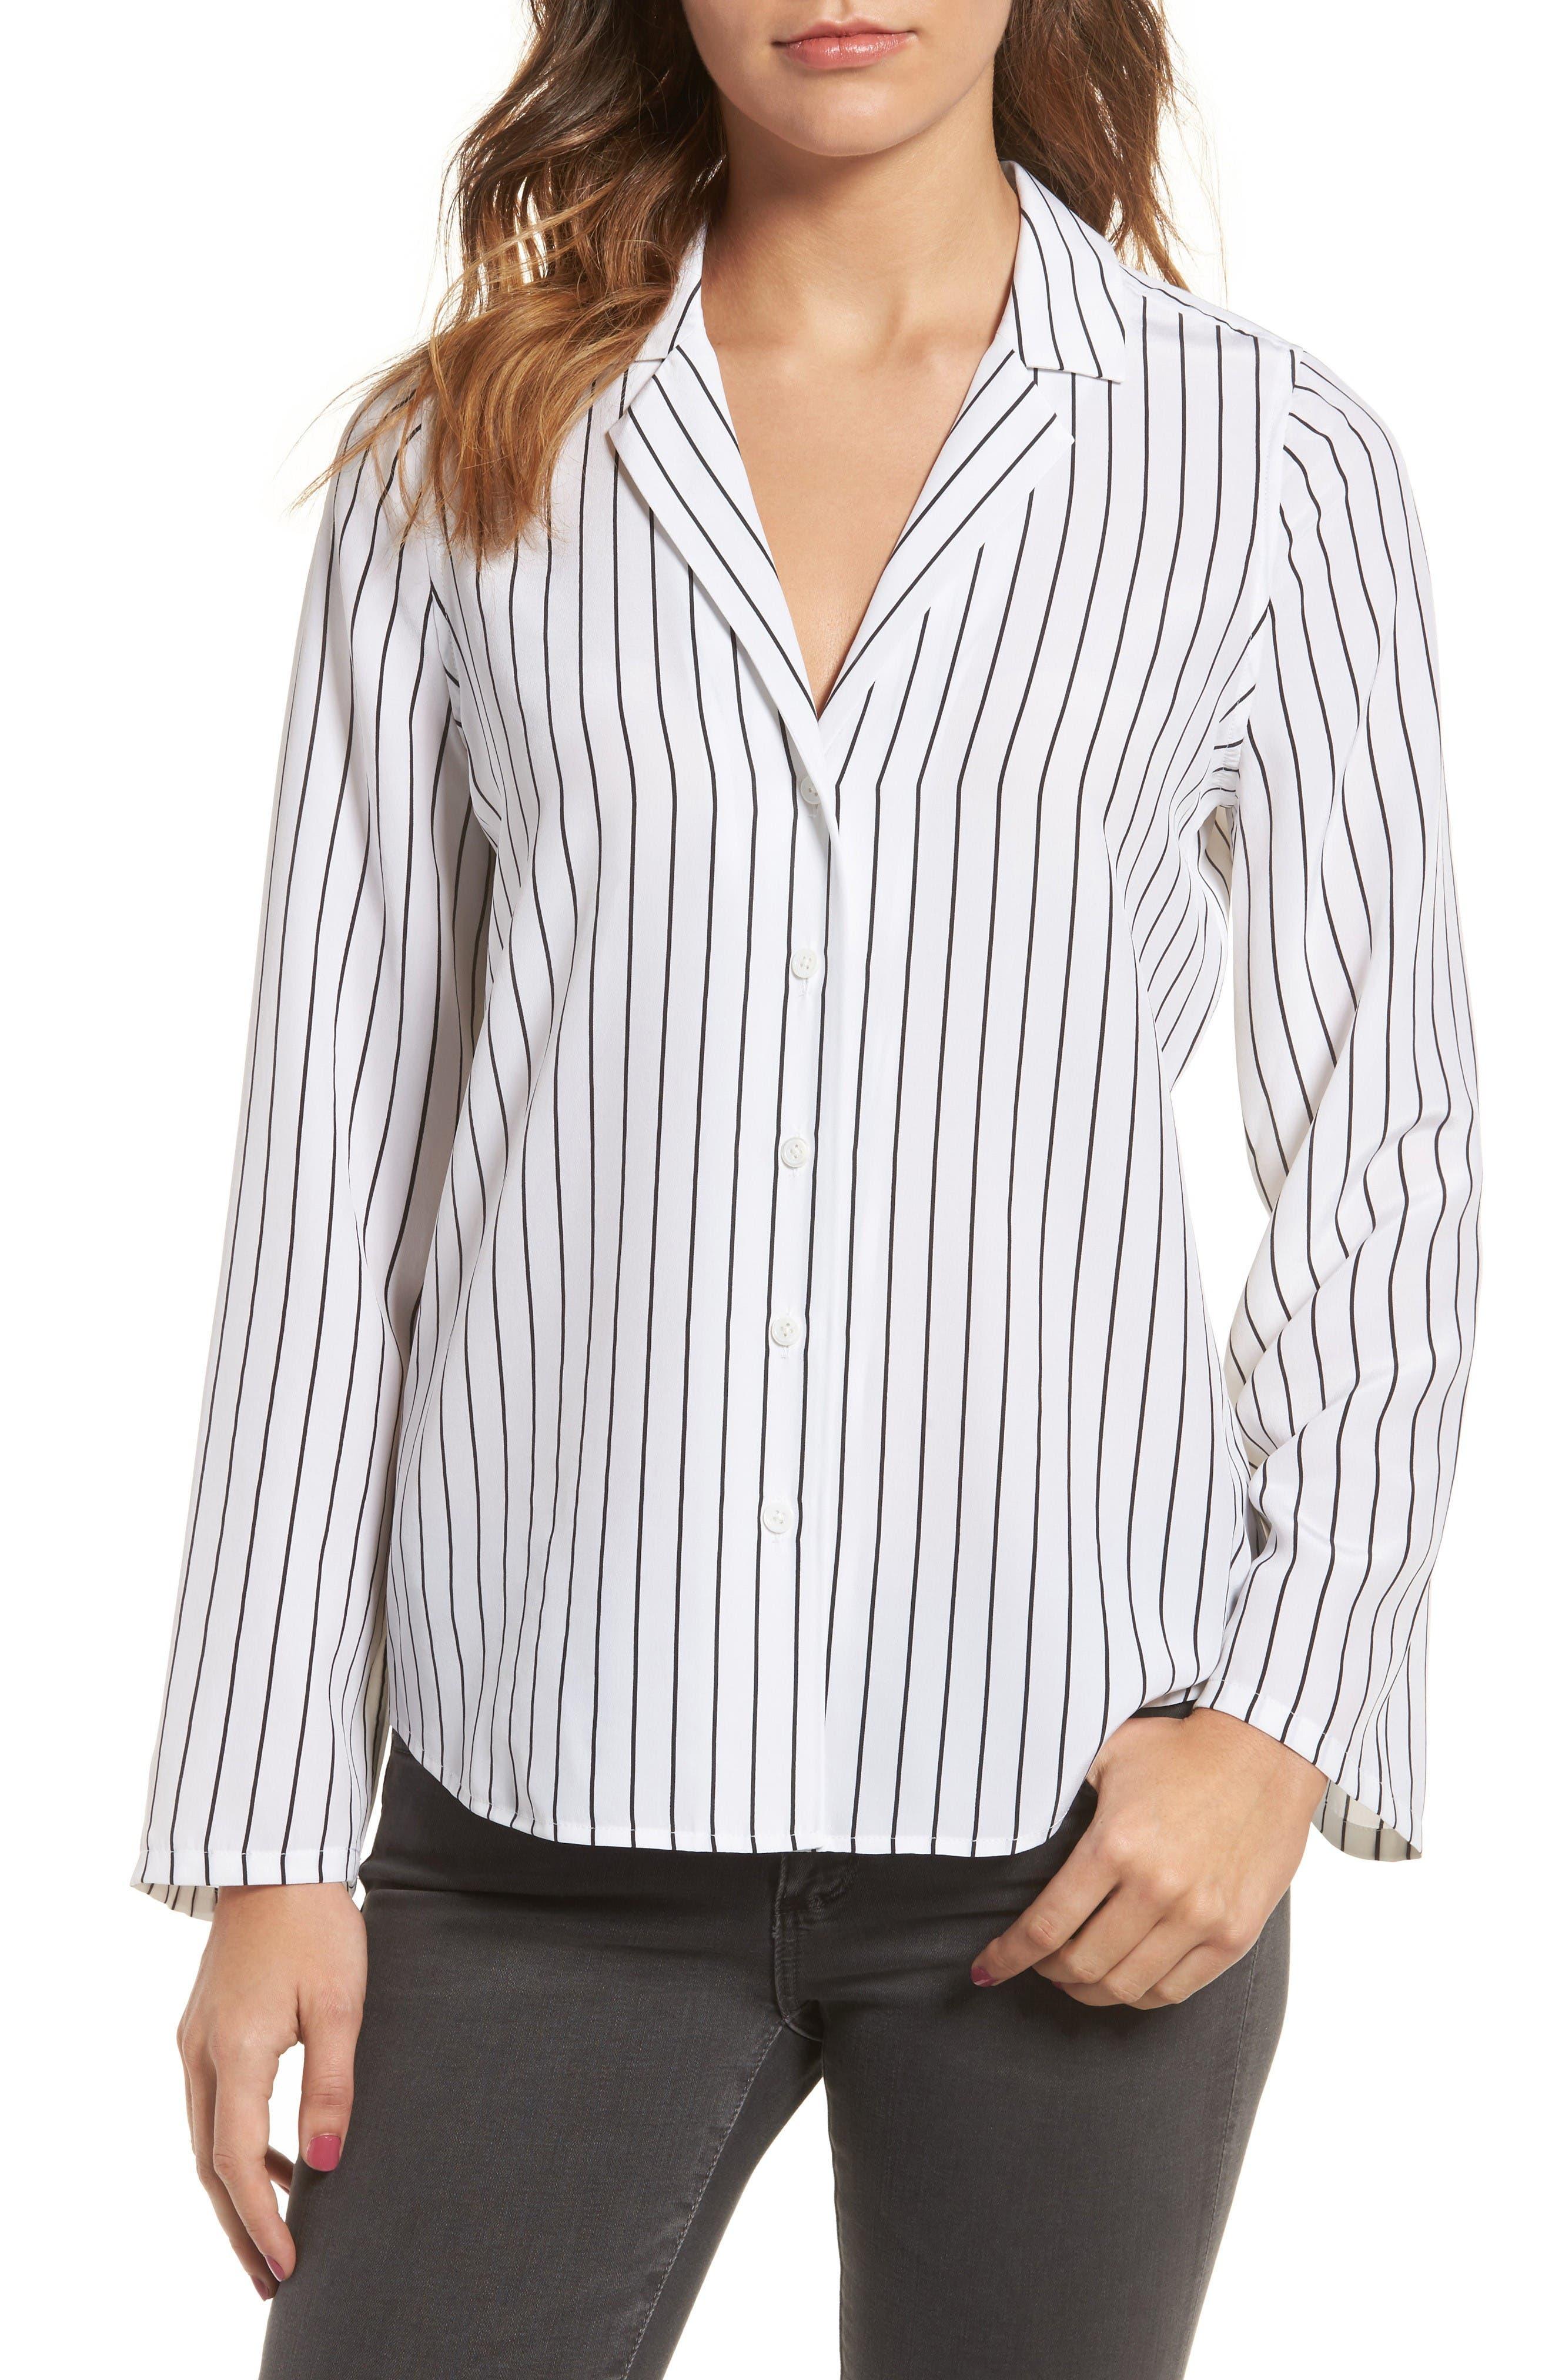 Avery Silk Shirt,                             Main thumbnail 1, color,                             True White / True Black Stripe